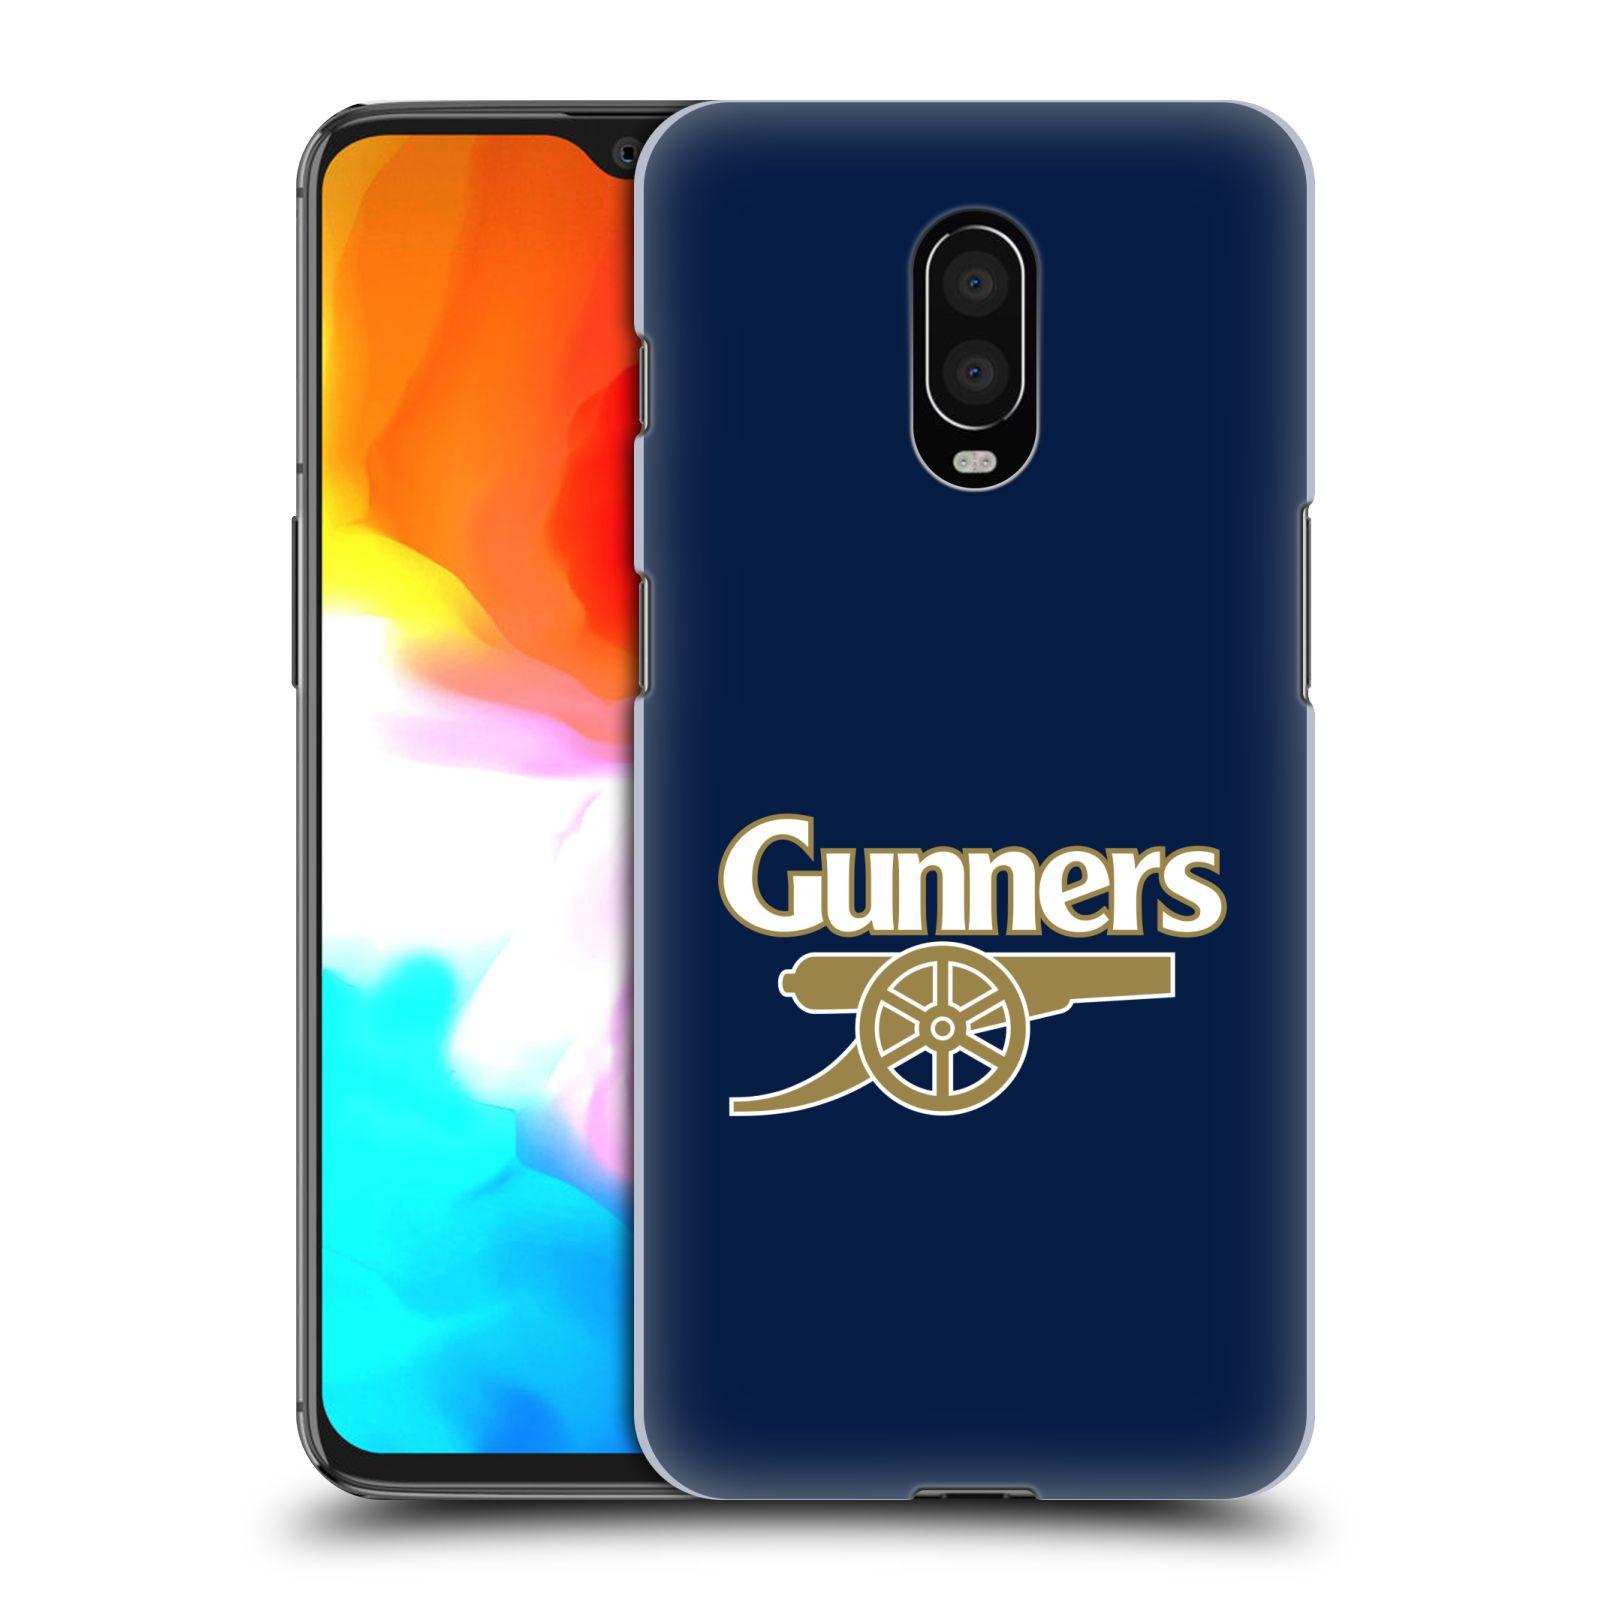 Plastové pouzdro na mobil OnePlus 6T - Head Case - Arsenal FC - Gunners